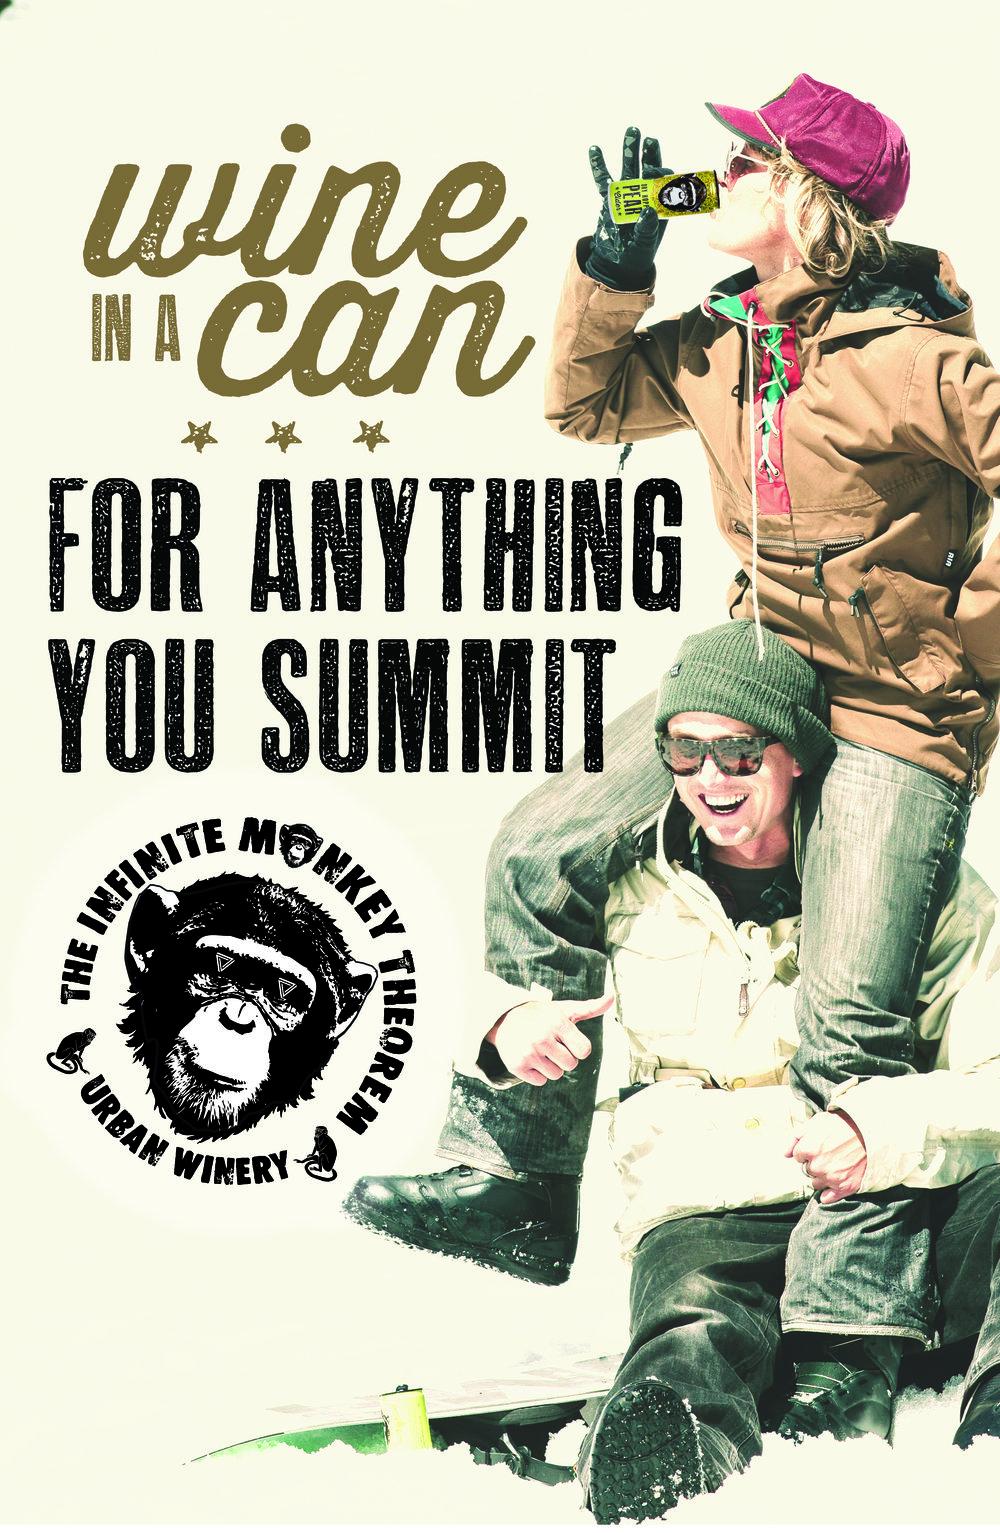 Lifestyle Summit Cider.jpg